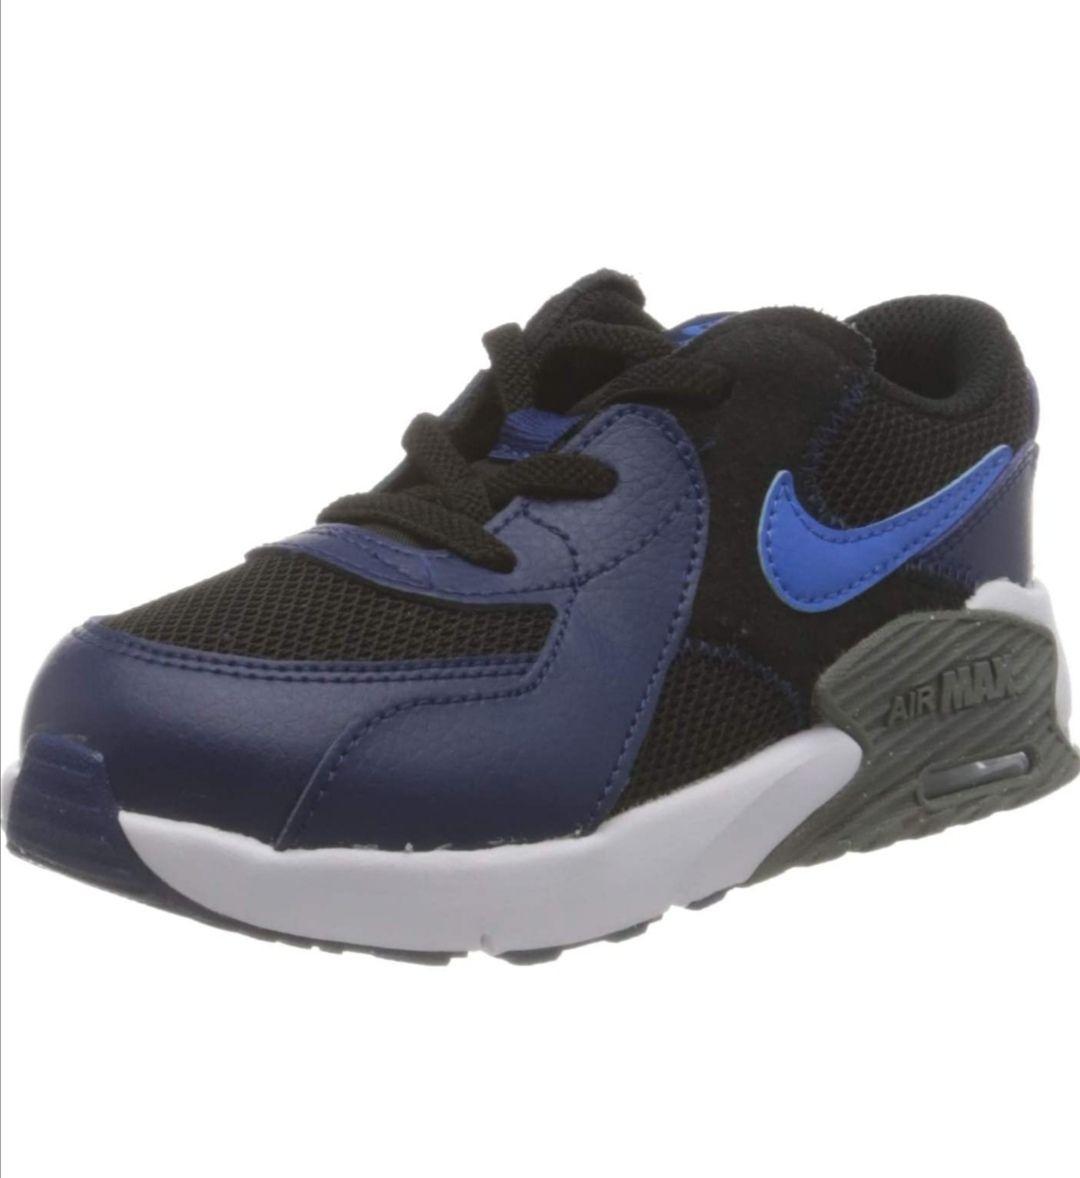 Nike Air Max Excee Kids! Maten 19.5 T/M 27